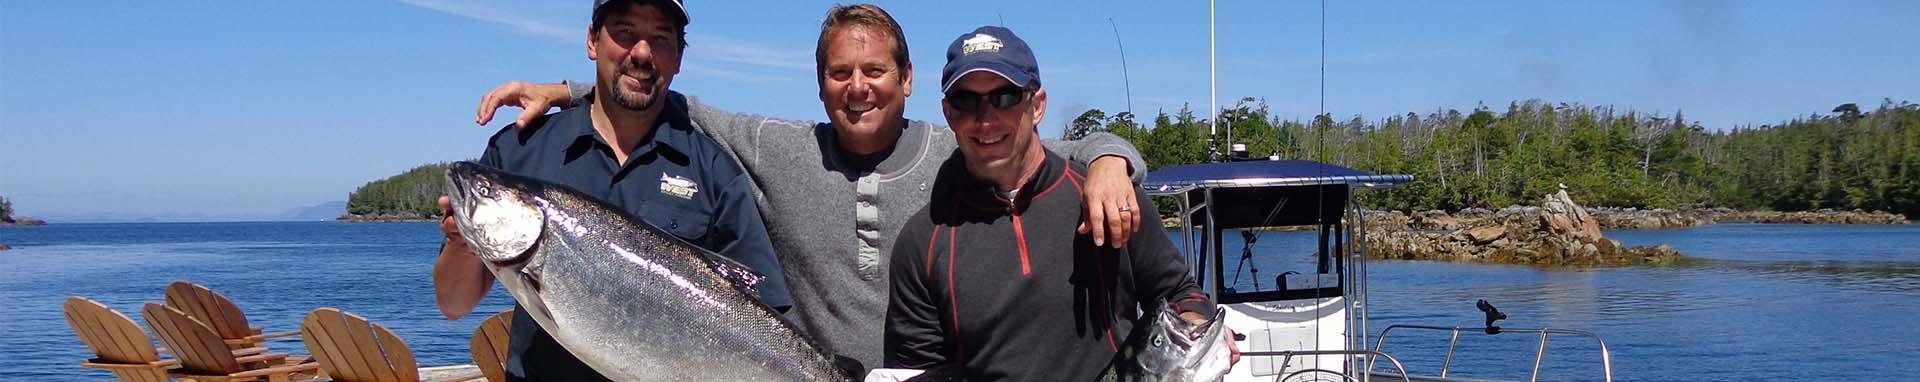 Chinook fishing trips